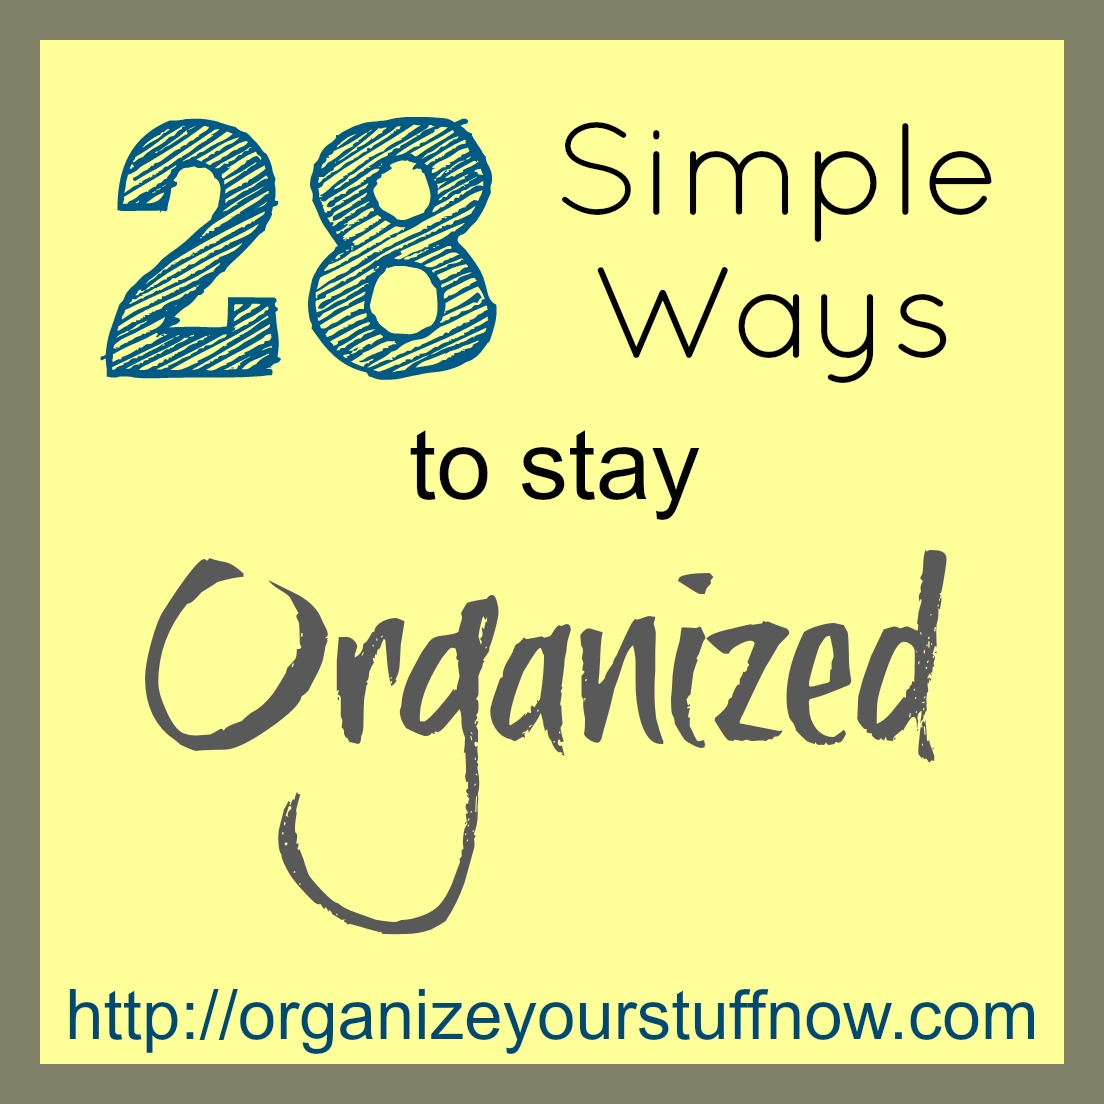 28 simple ways to stay organized